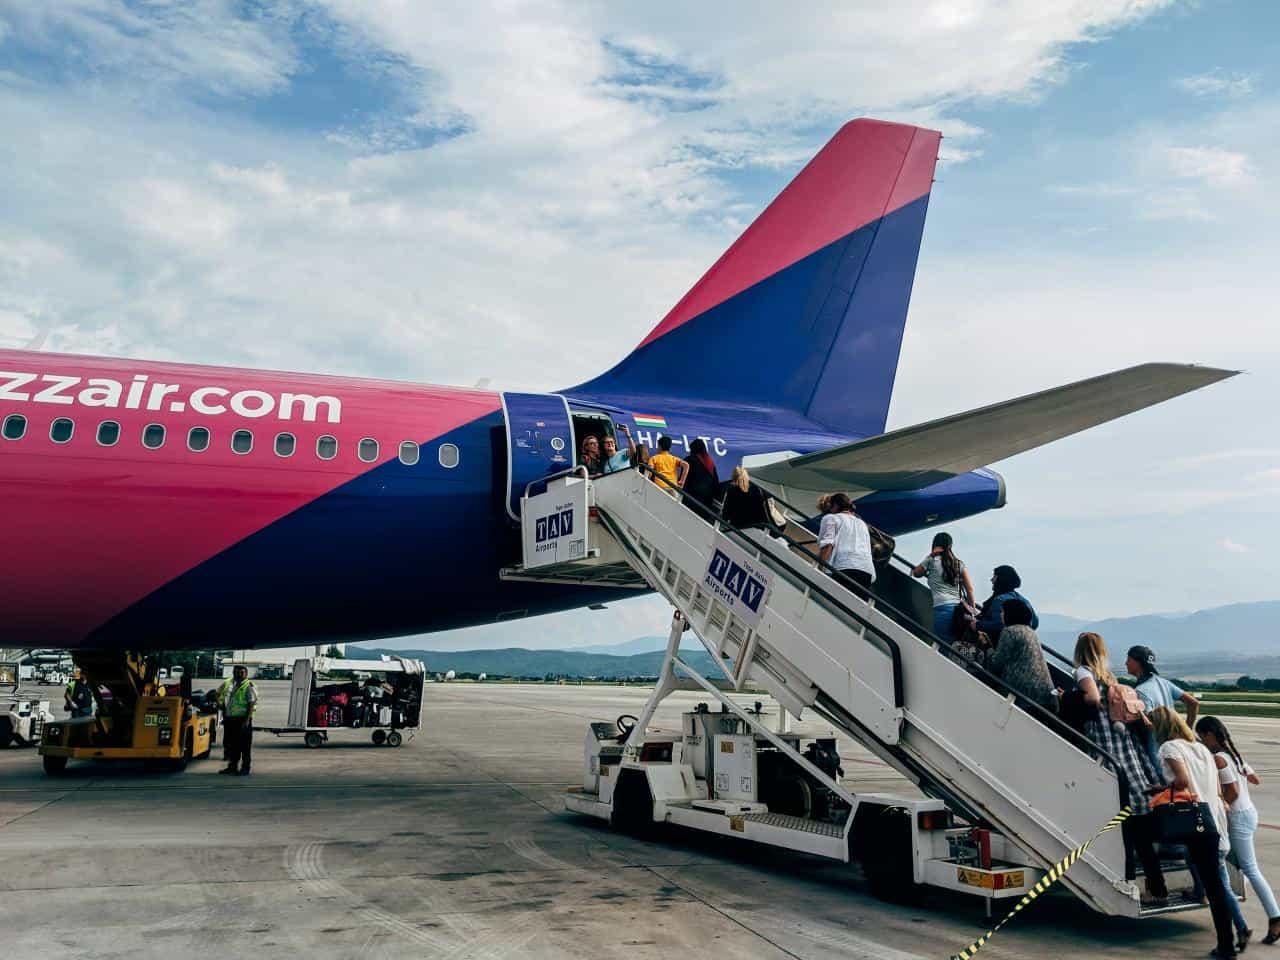 wizz air евтини самолетни билети - Wizz air евтини самолетни билети